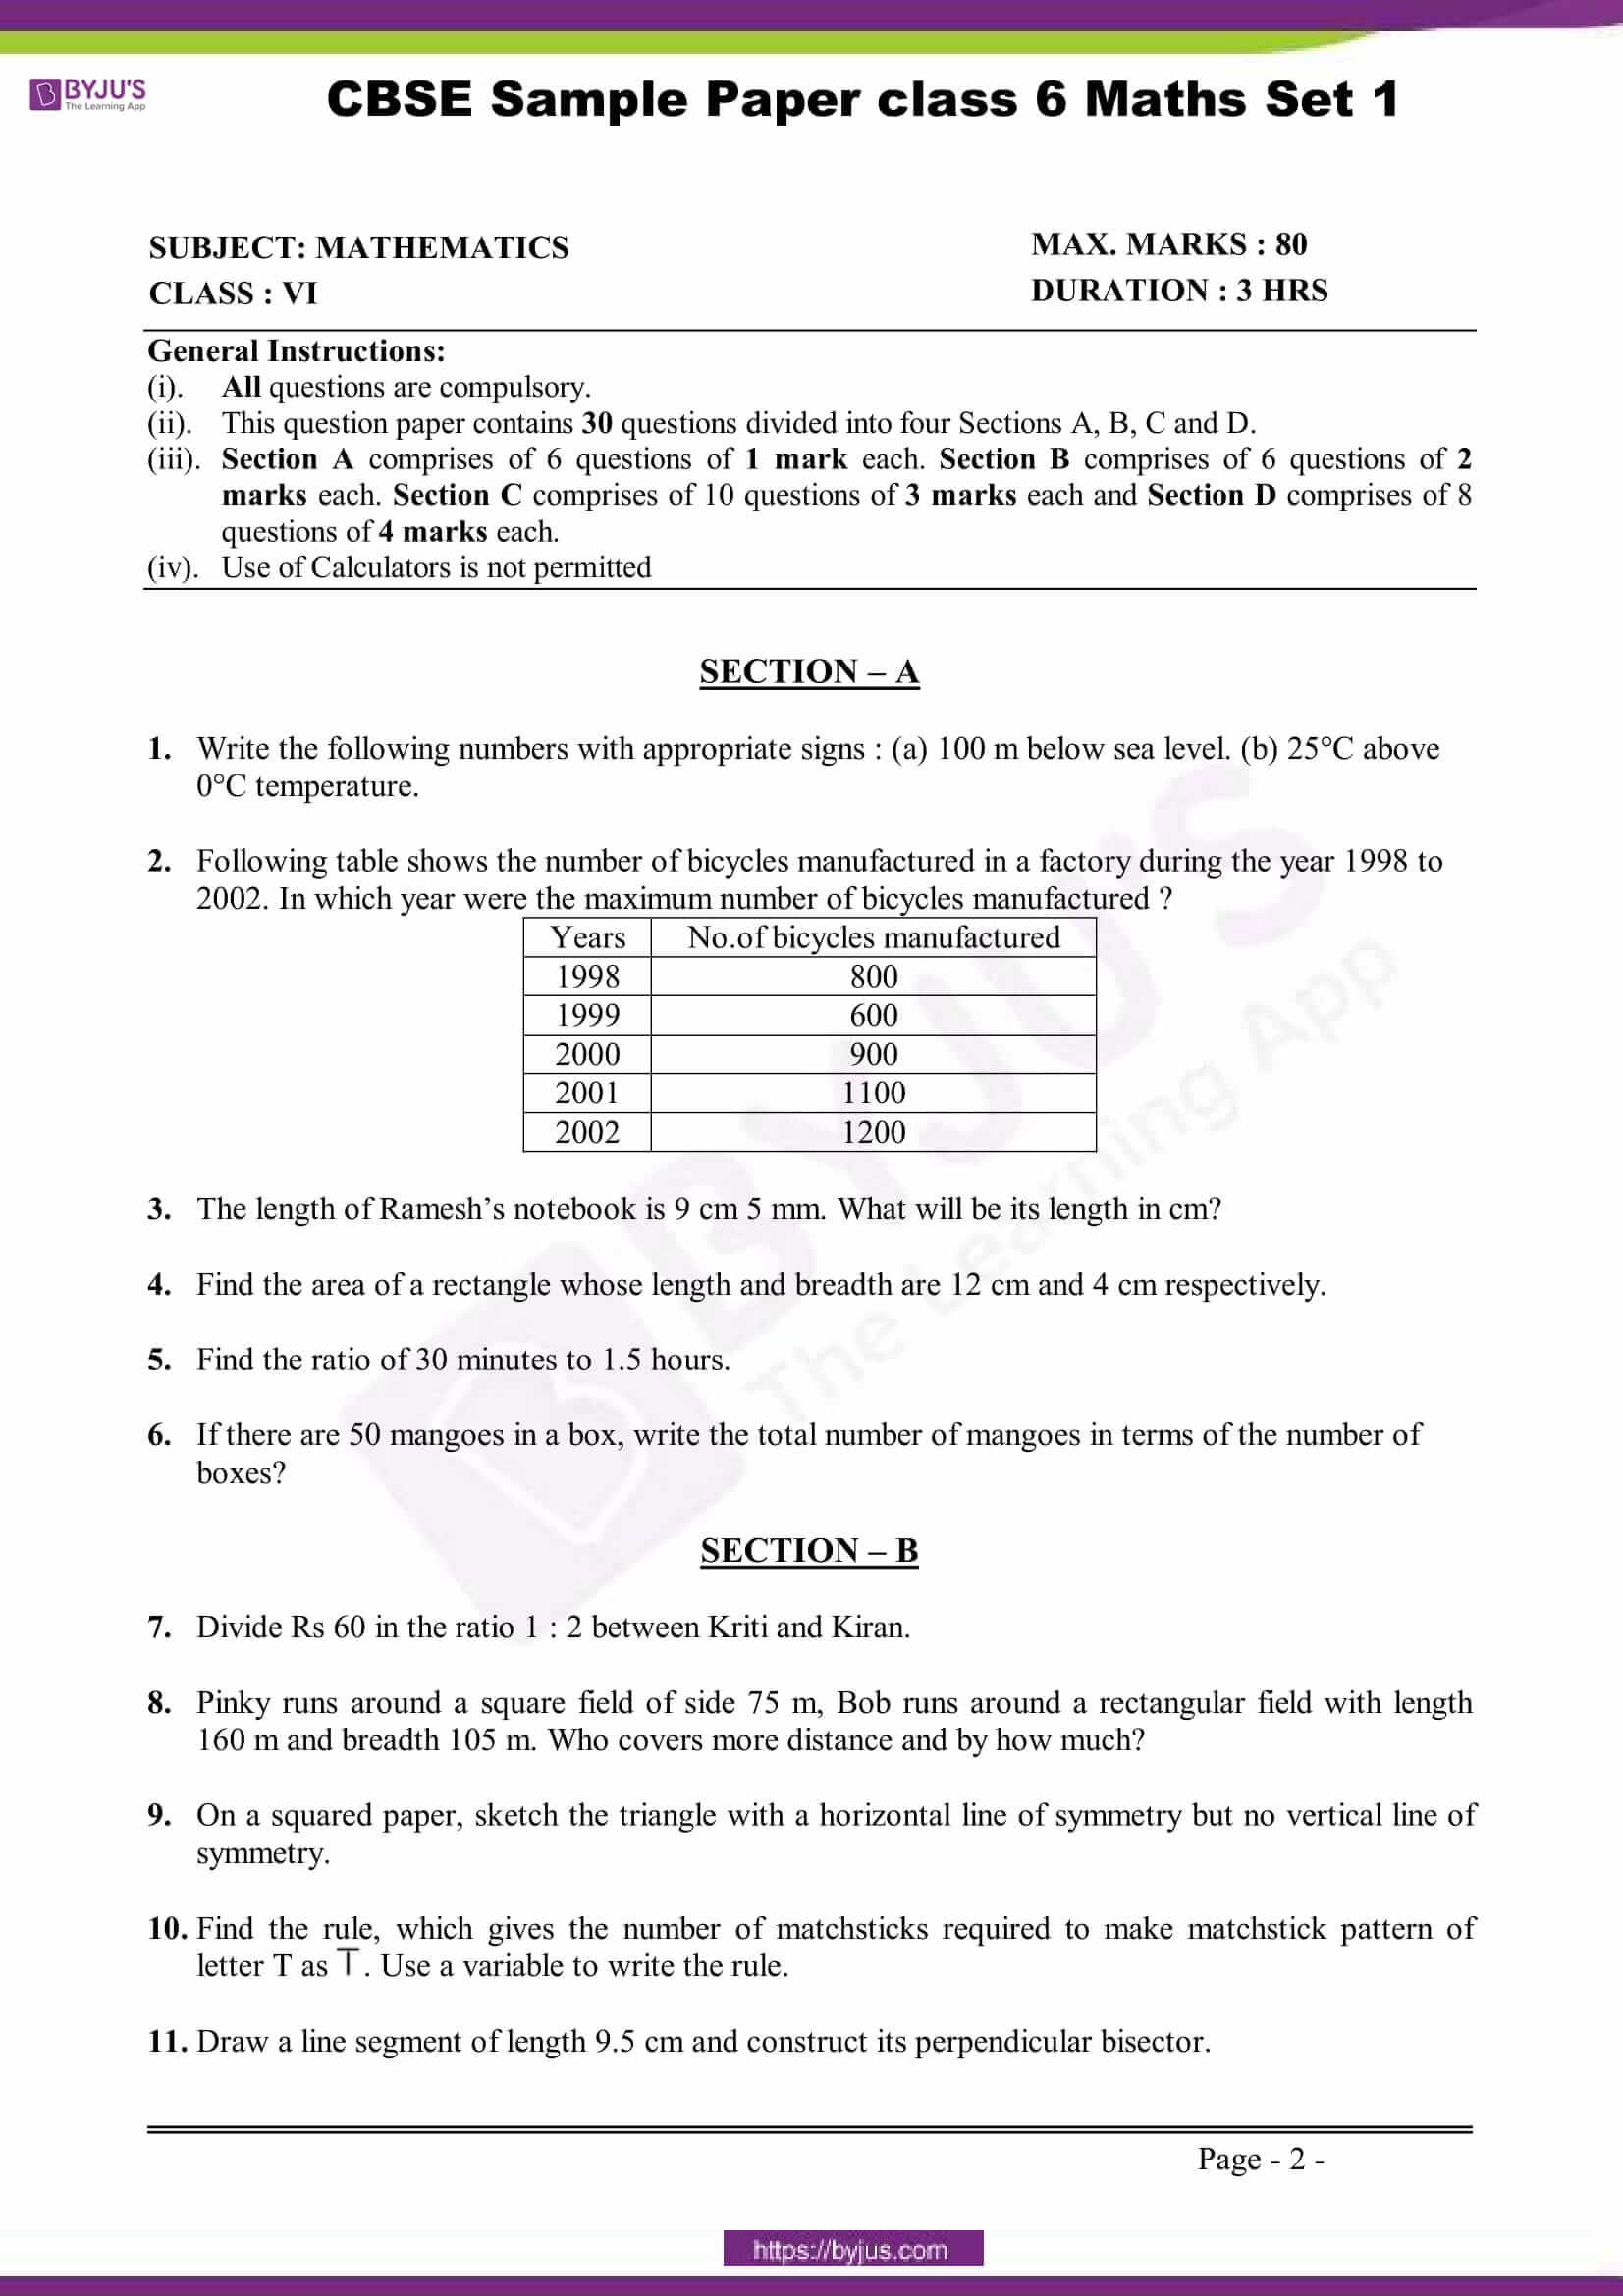 hight resolution of Download CBSE Class 6 Maths Sample Paper Set 1 PDF